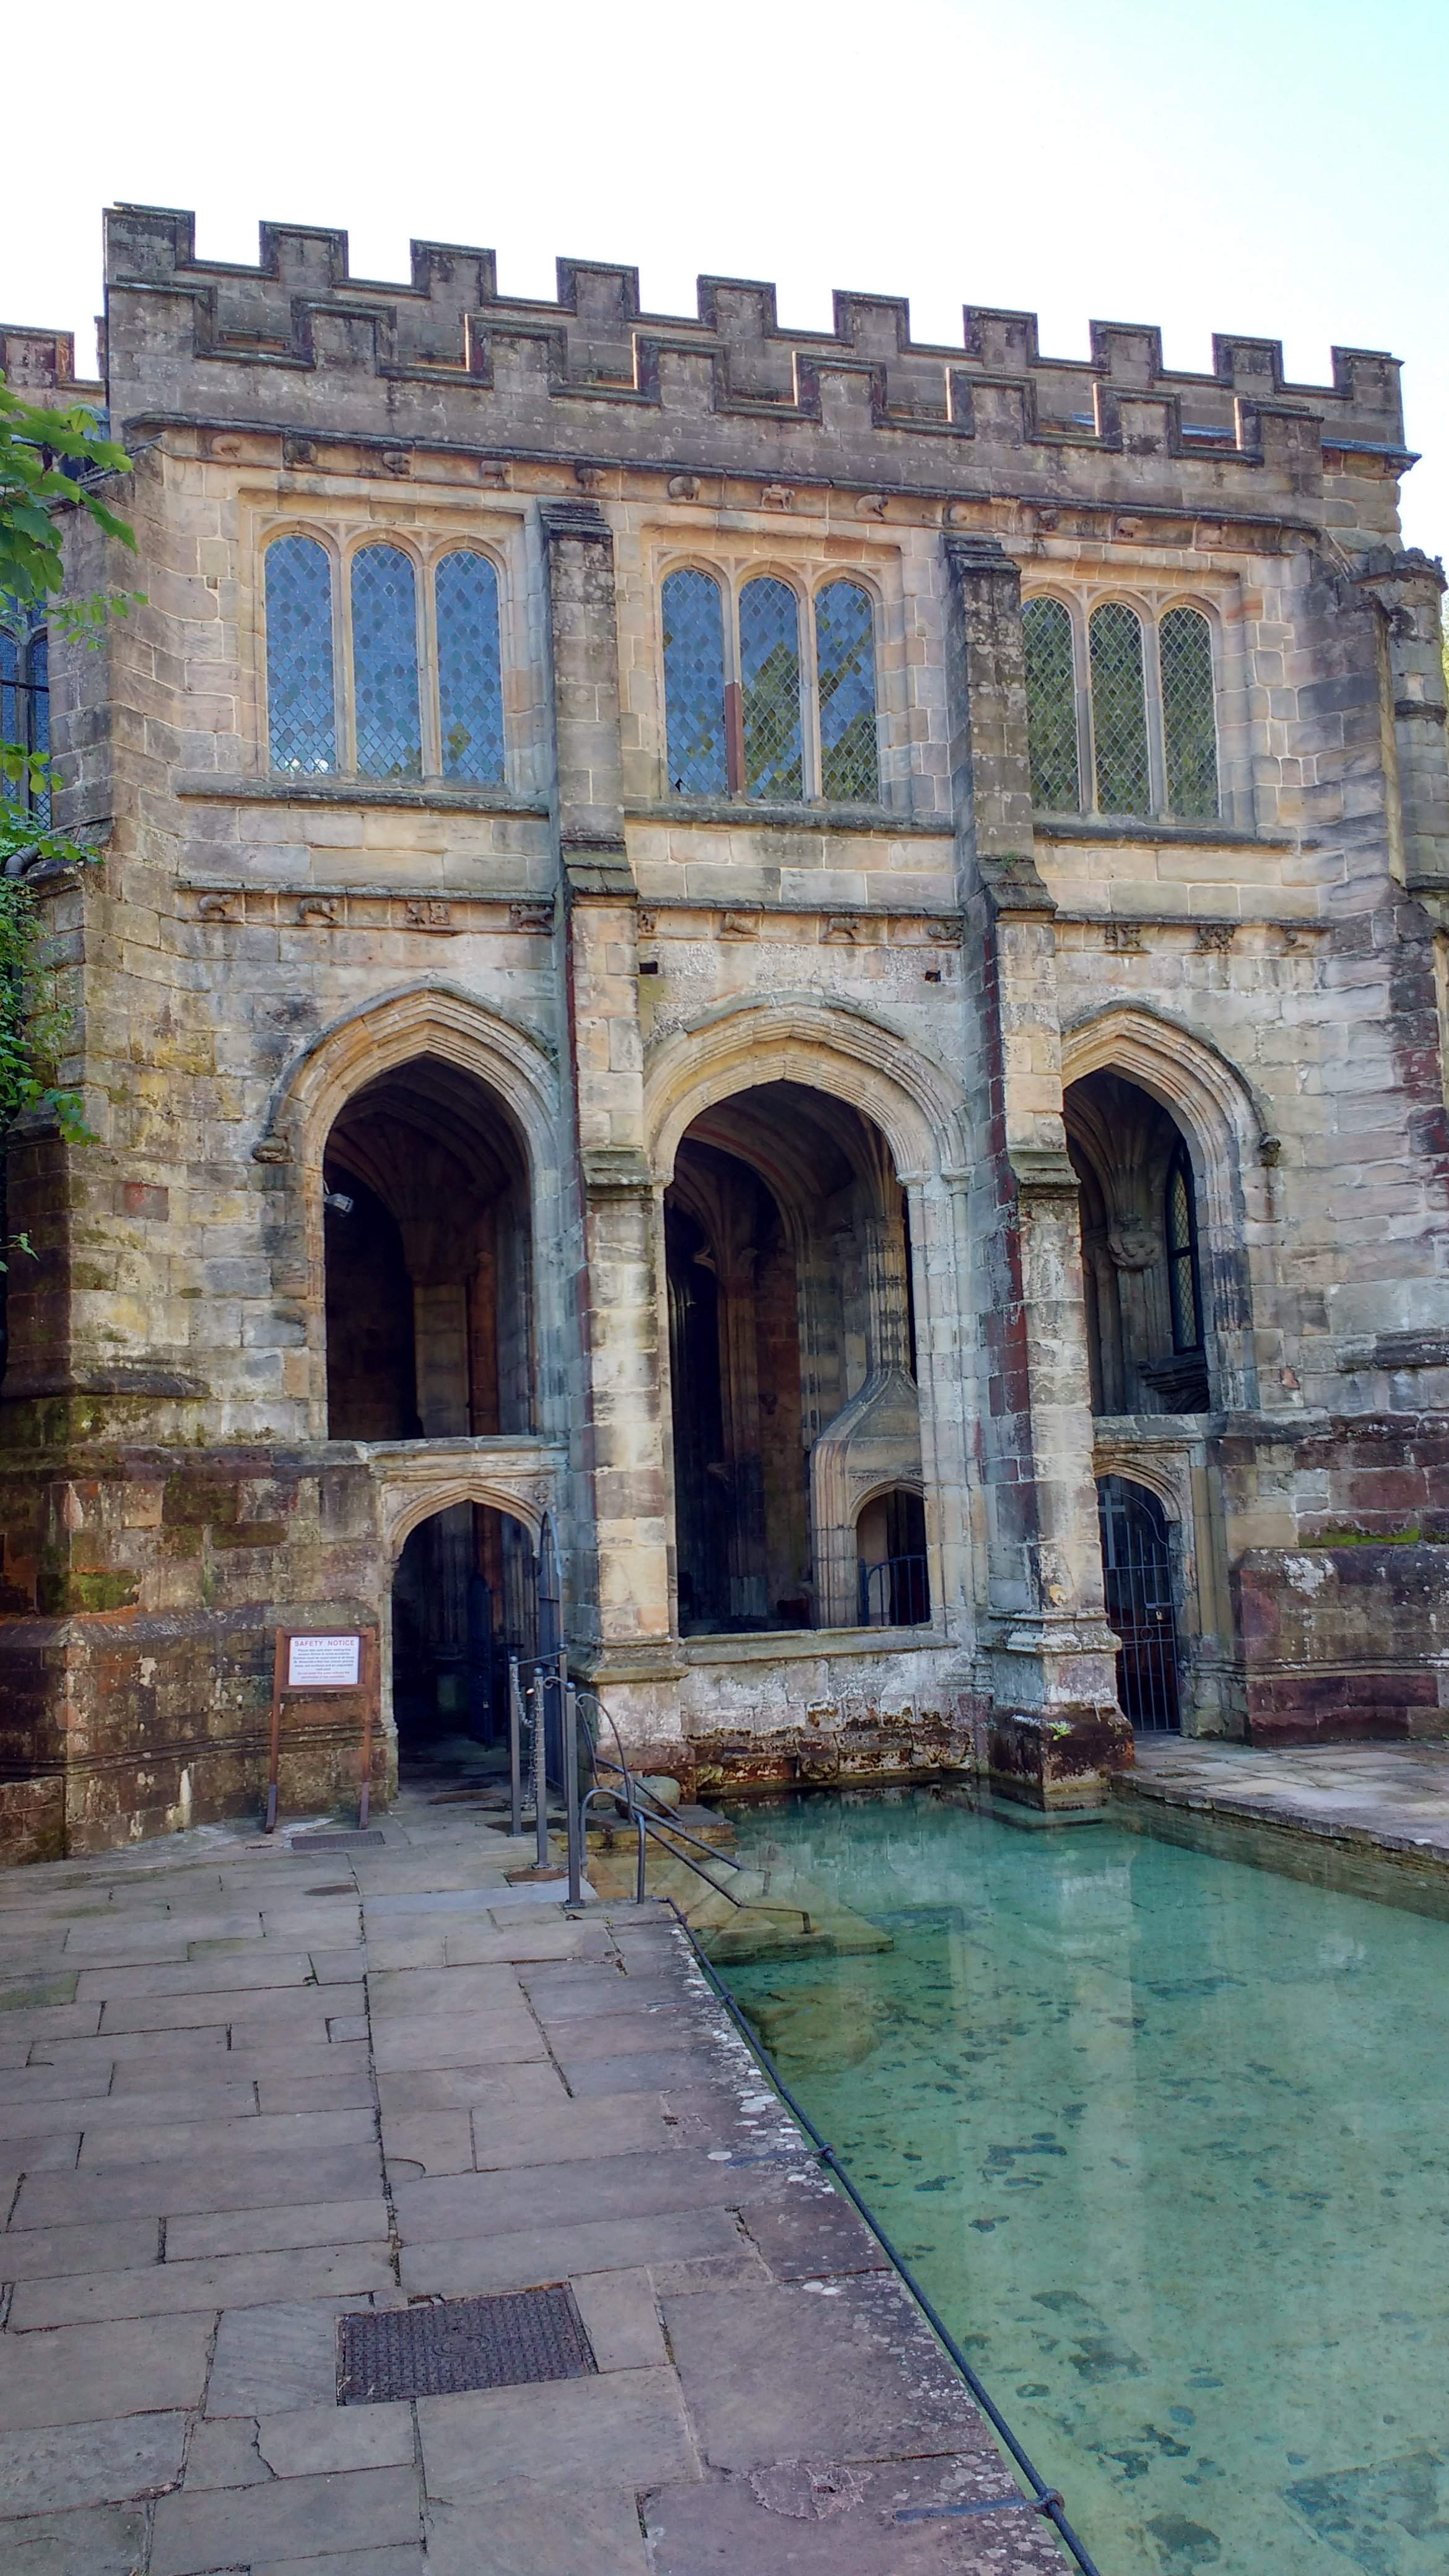 St Winifred's Well Holywell